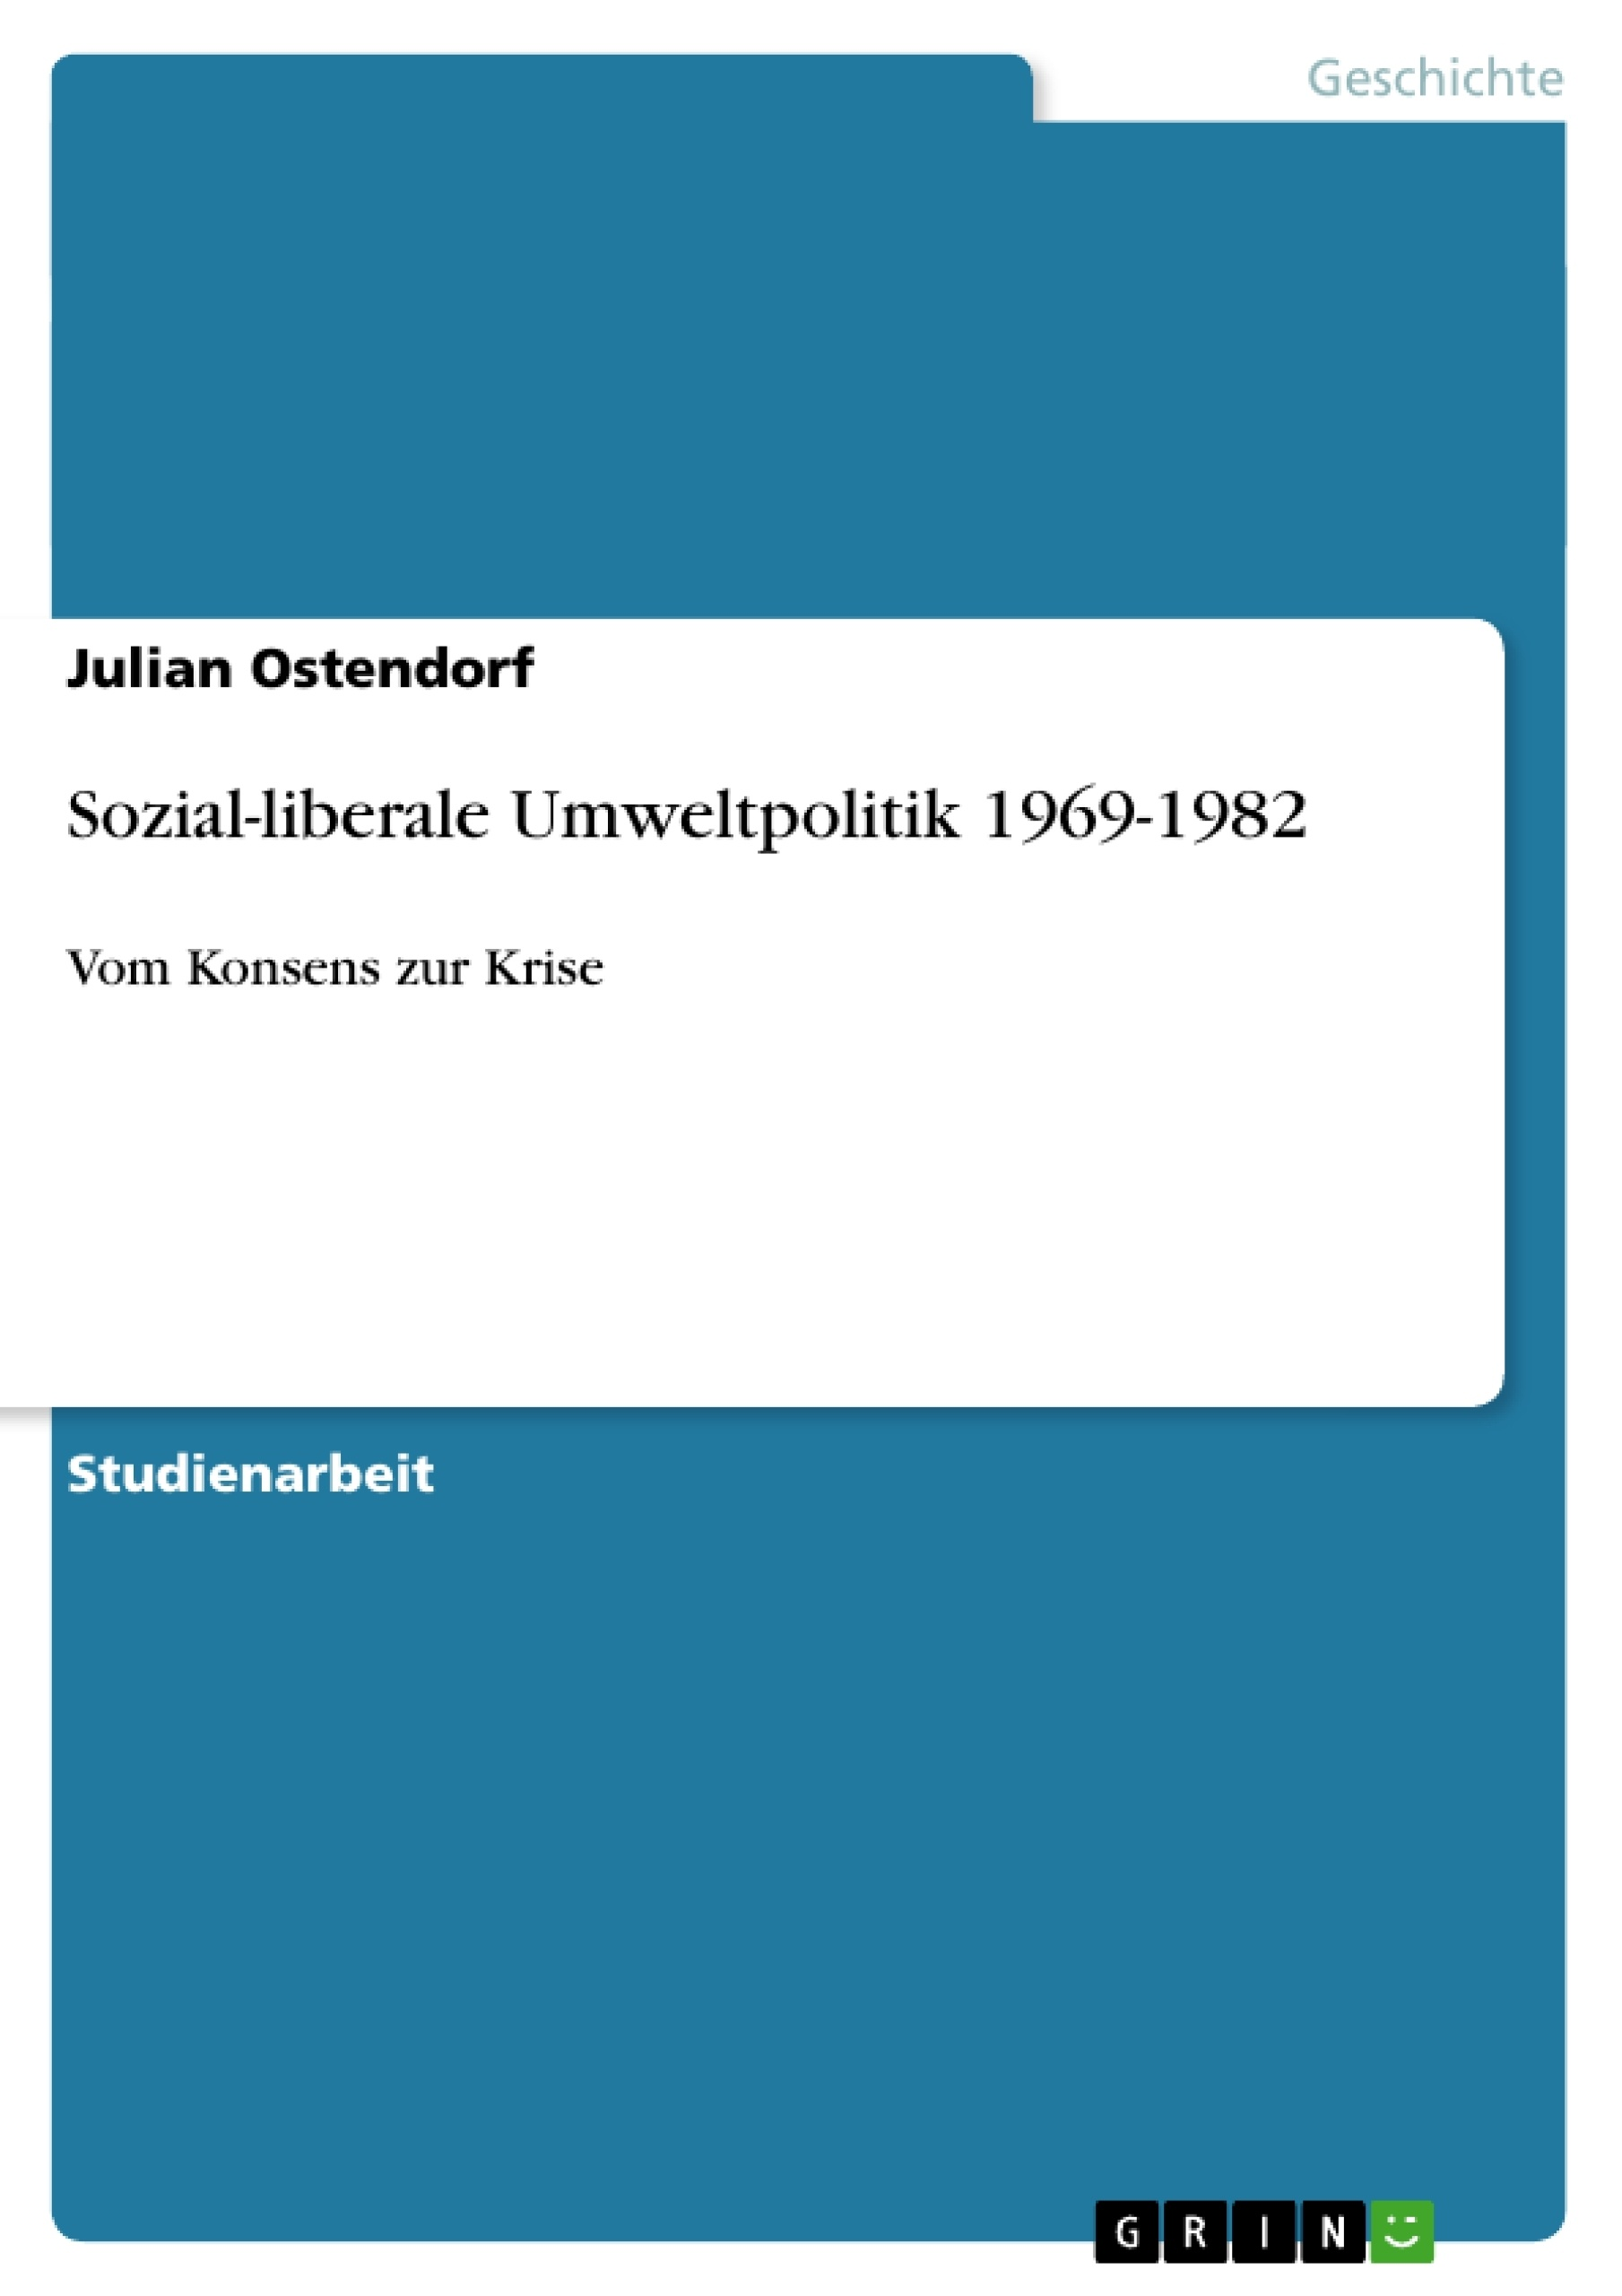 Titel: Sozial-liberale Umweltpolitik 1969-1982